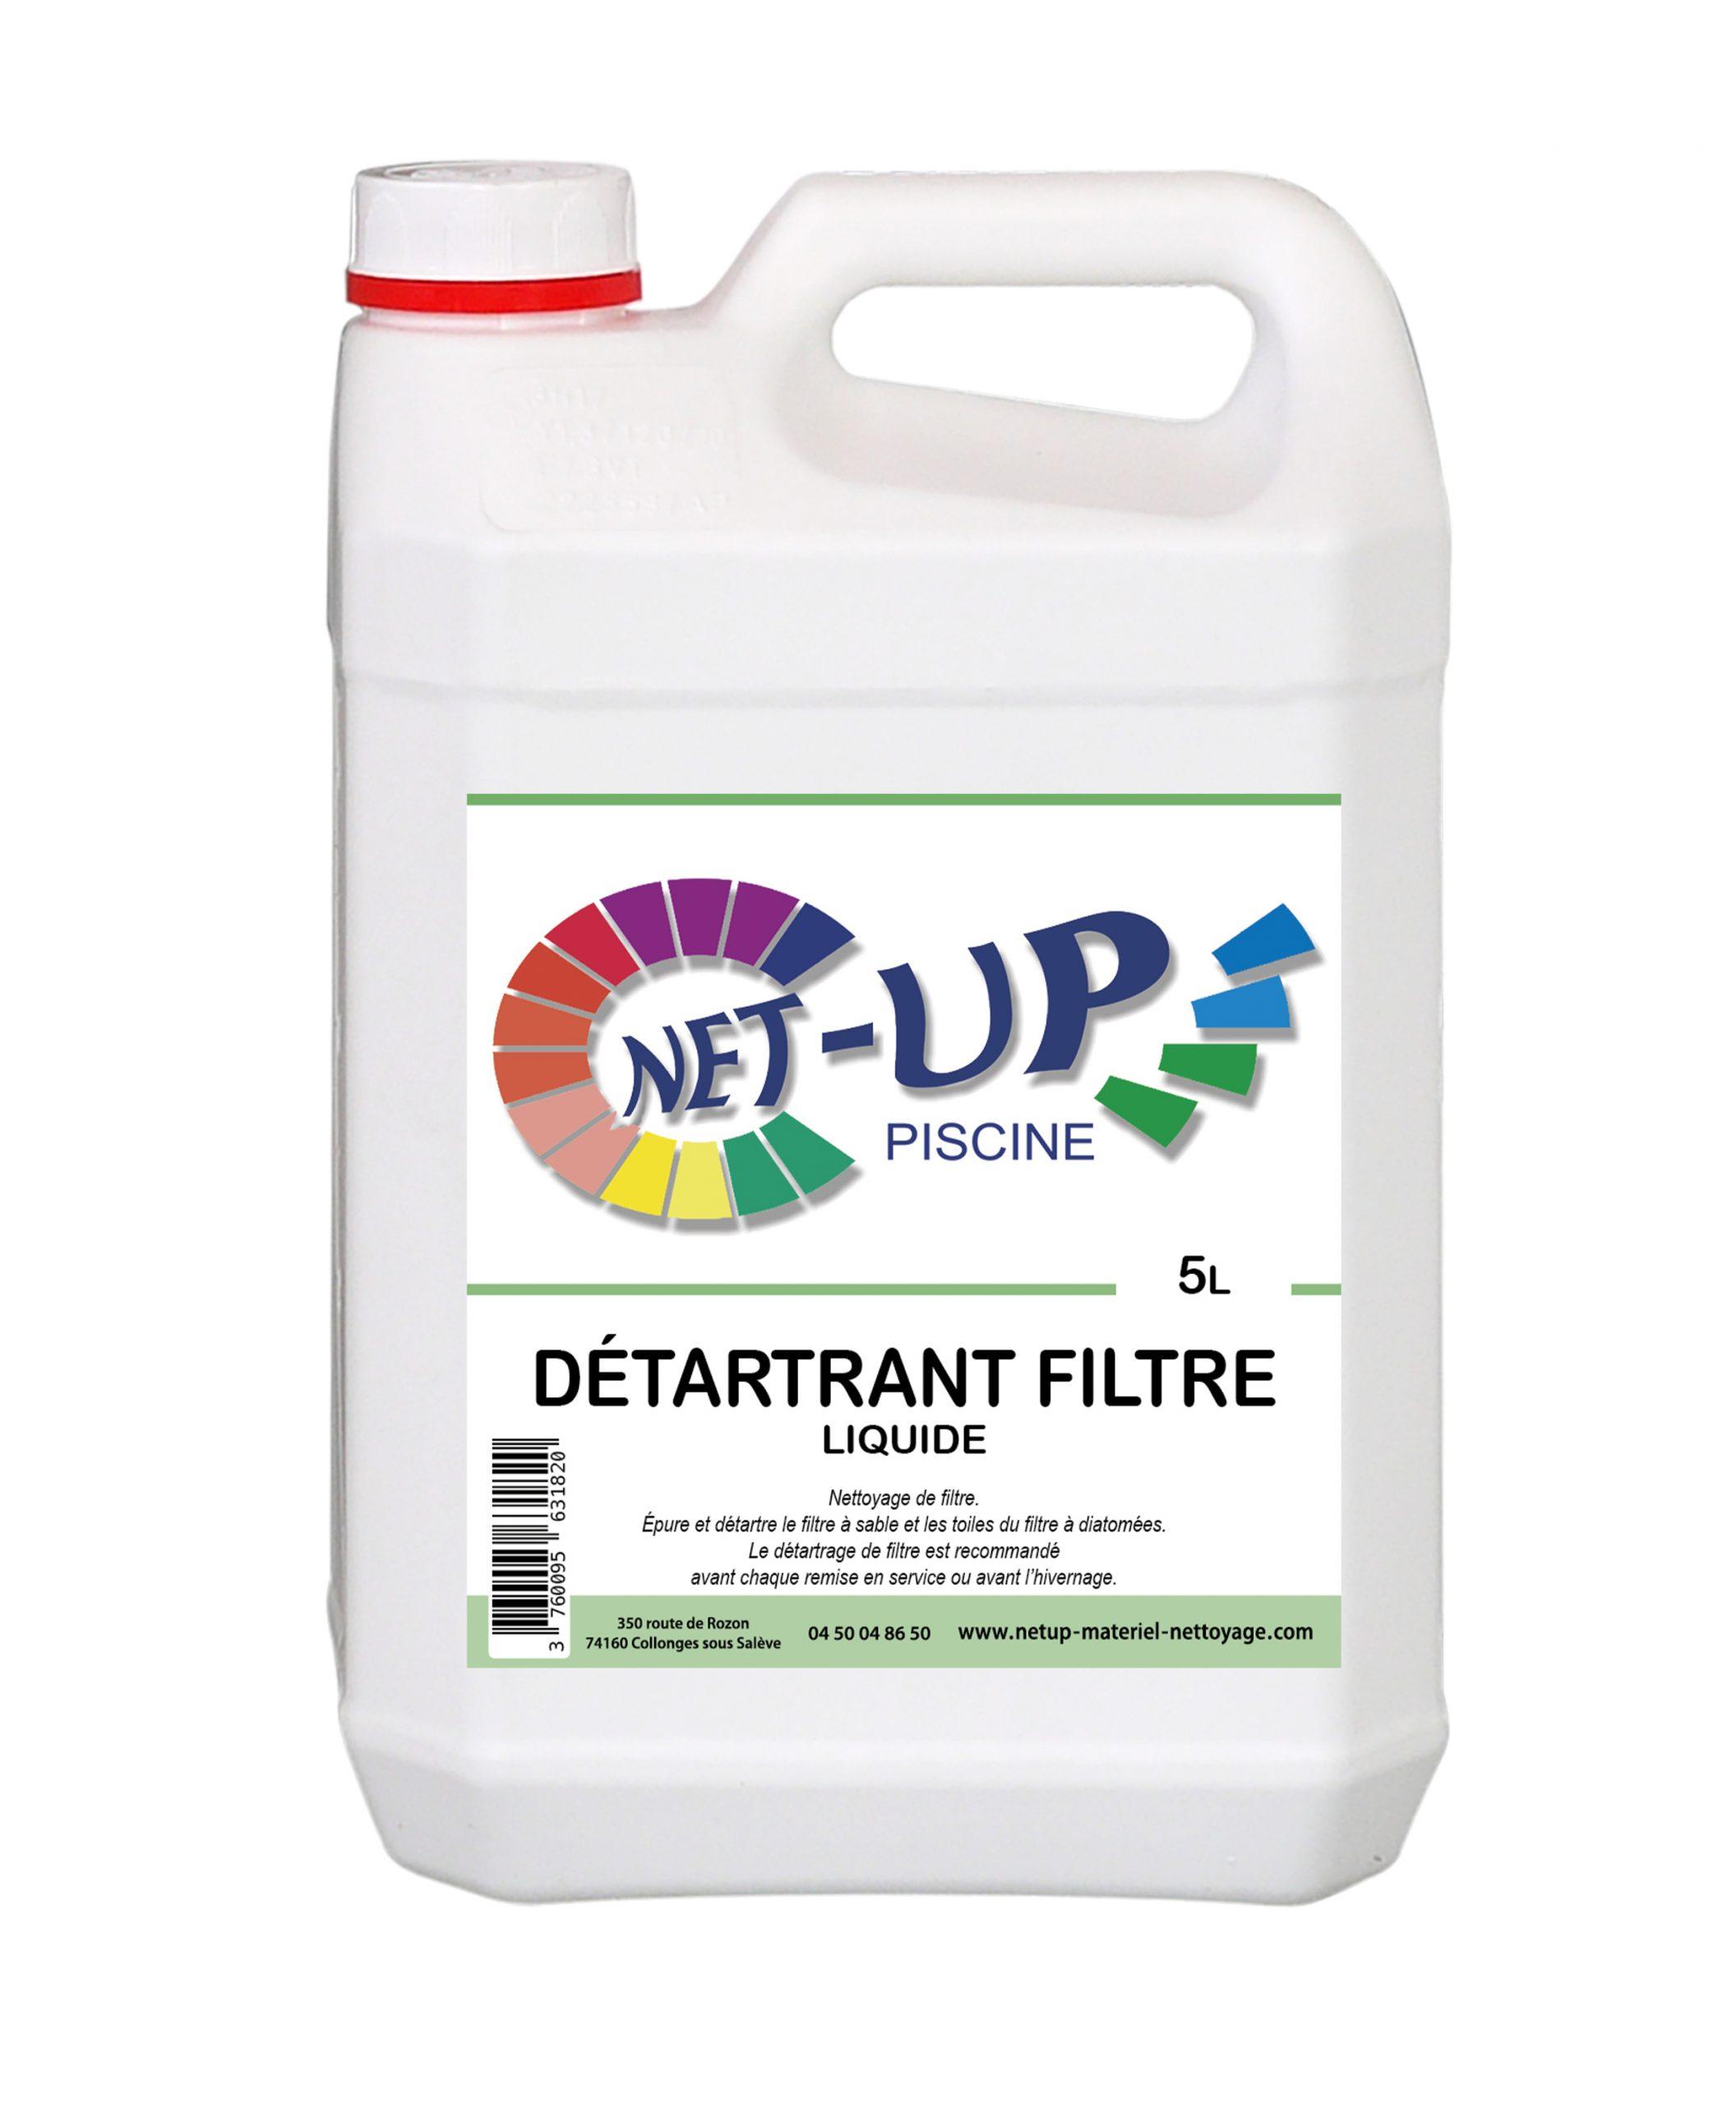 Detartrant Filtre 5L 33,98 € Ocedis encequiconcerne Anti Calcaire Piscine